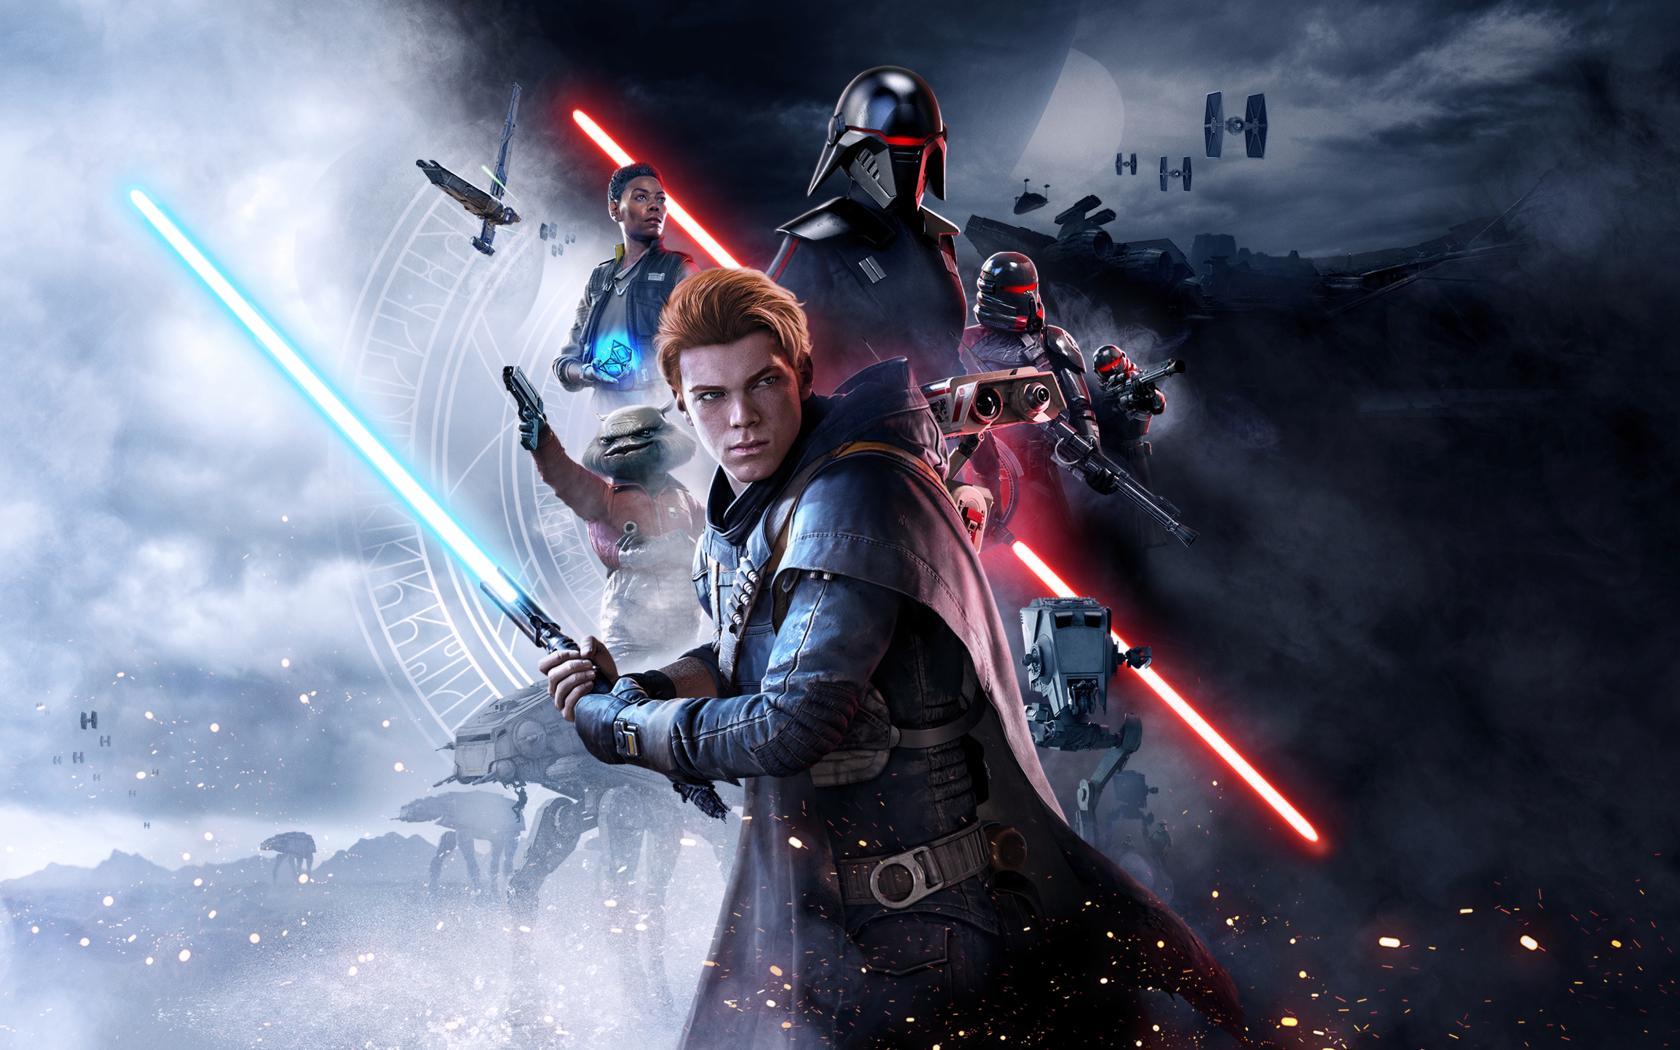 1680x1050 Star Wars Jedi Fallen Order Poster 2019 ...